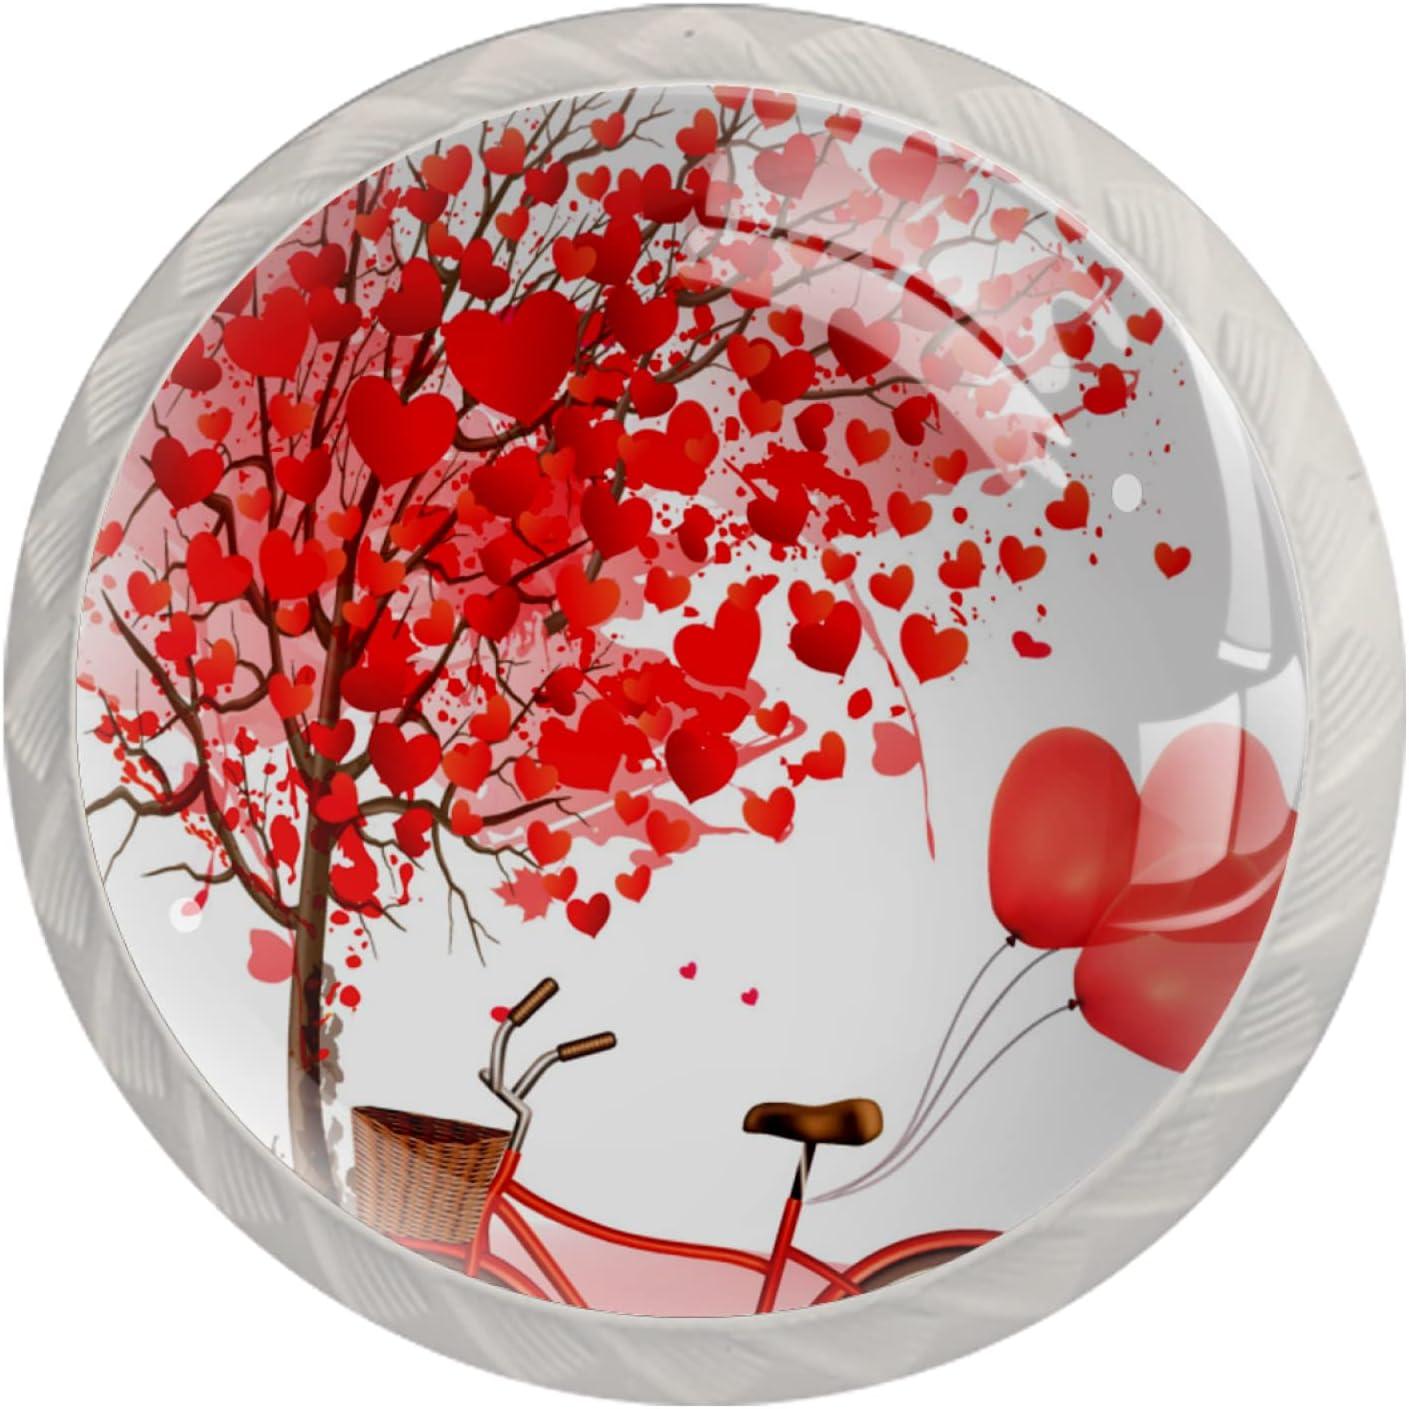 Round Cabinet Hardware Knob 4 Pack Day - mart Pink Valentines Cheap bargain Three